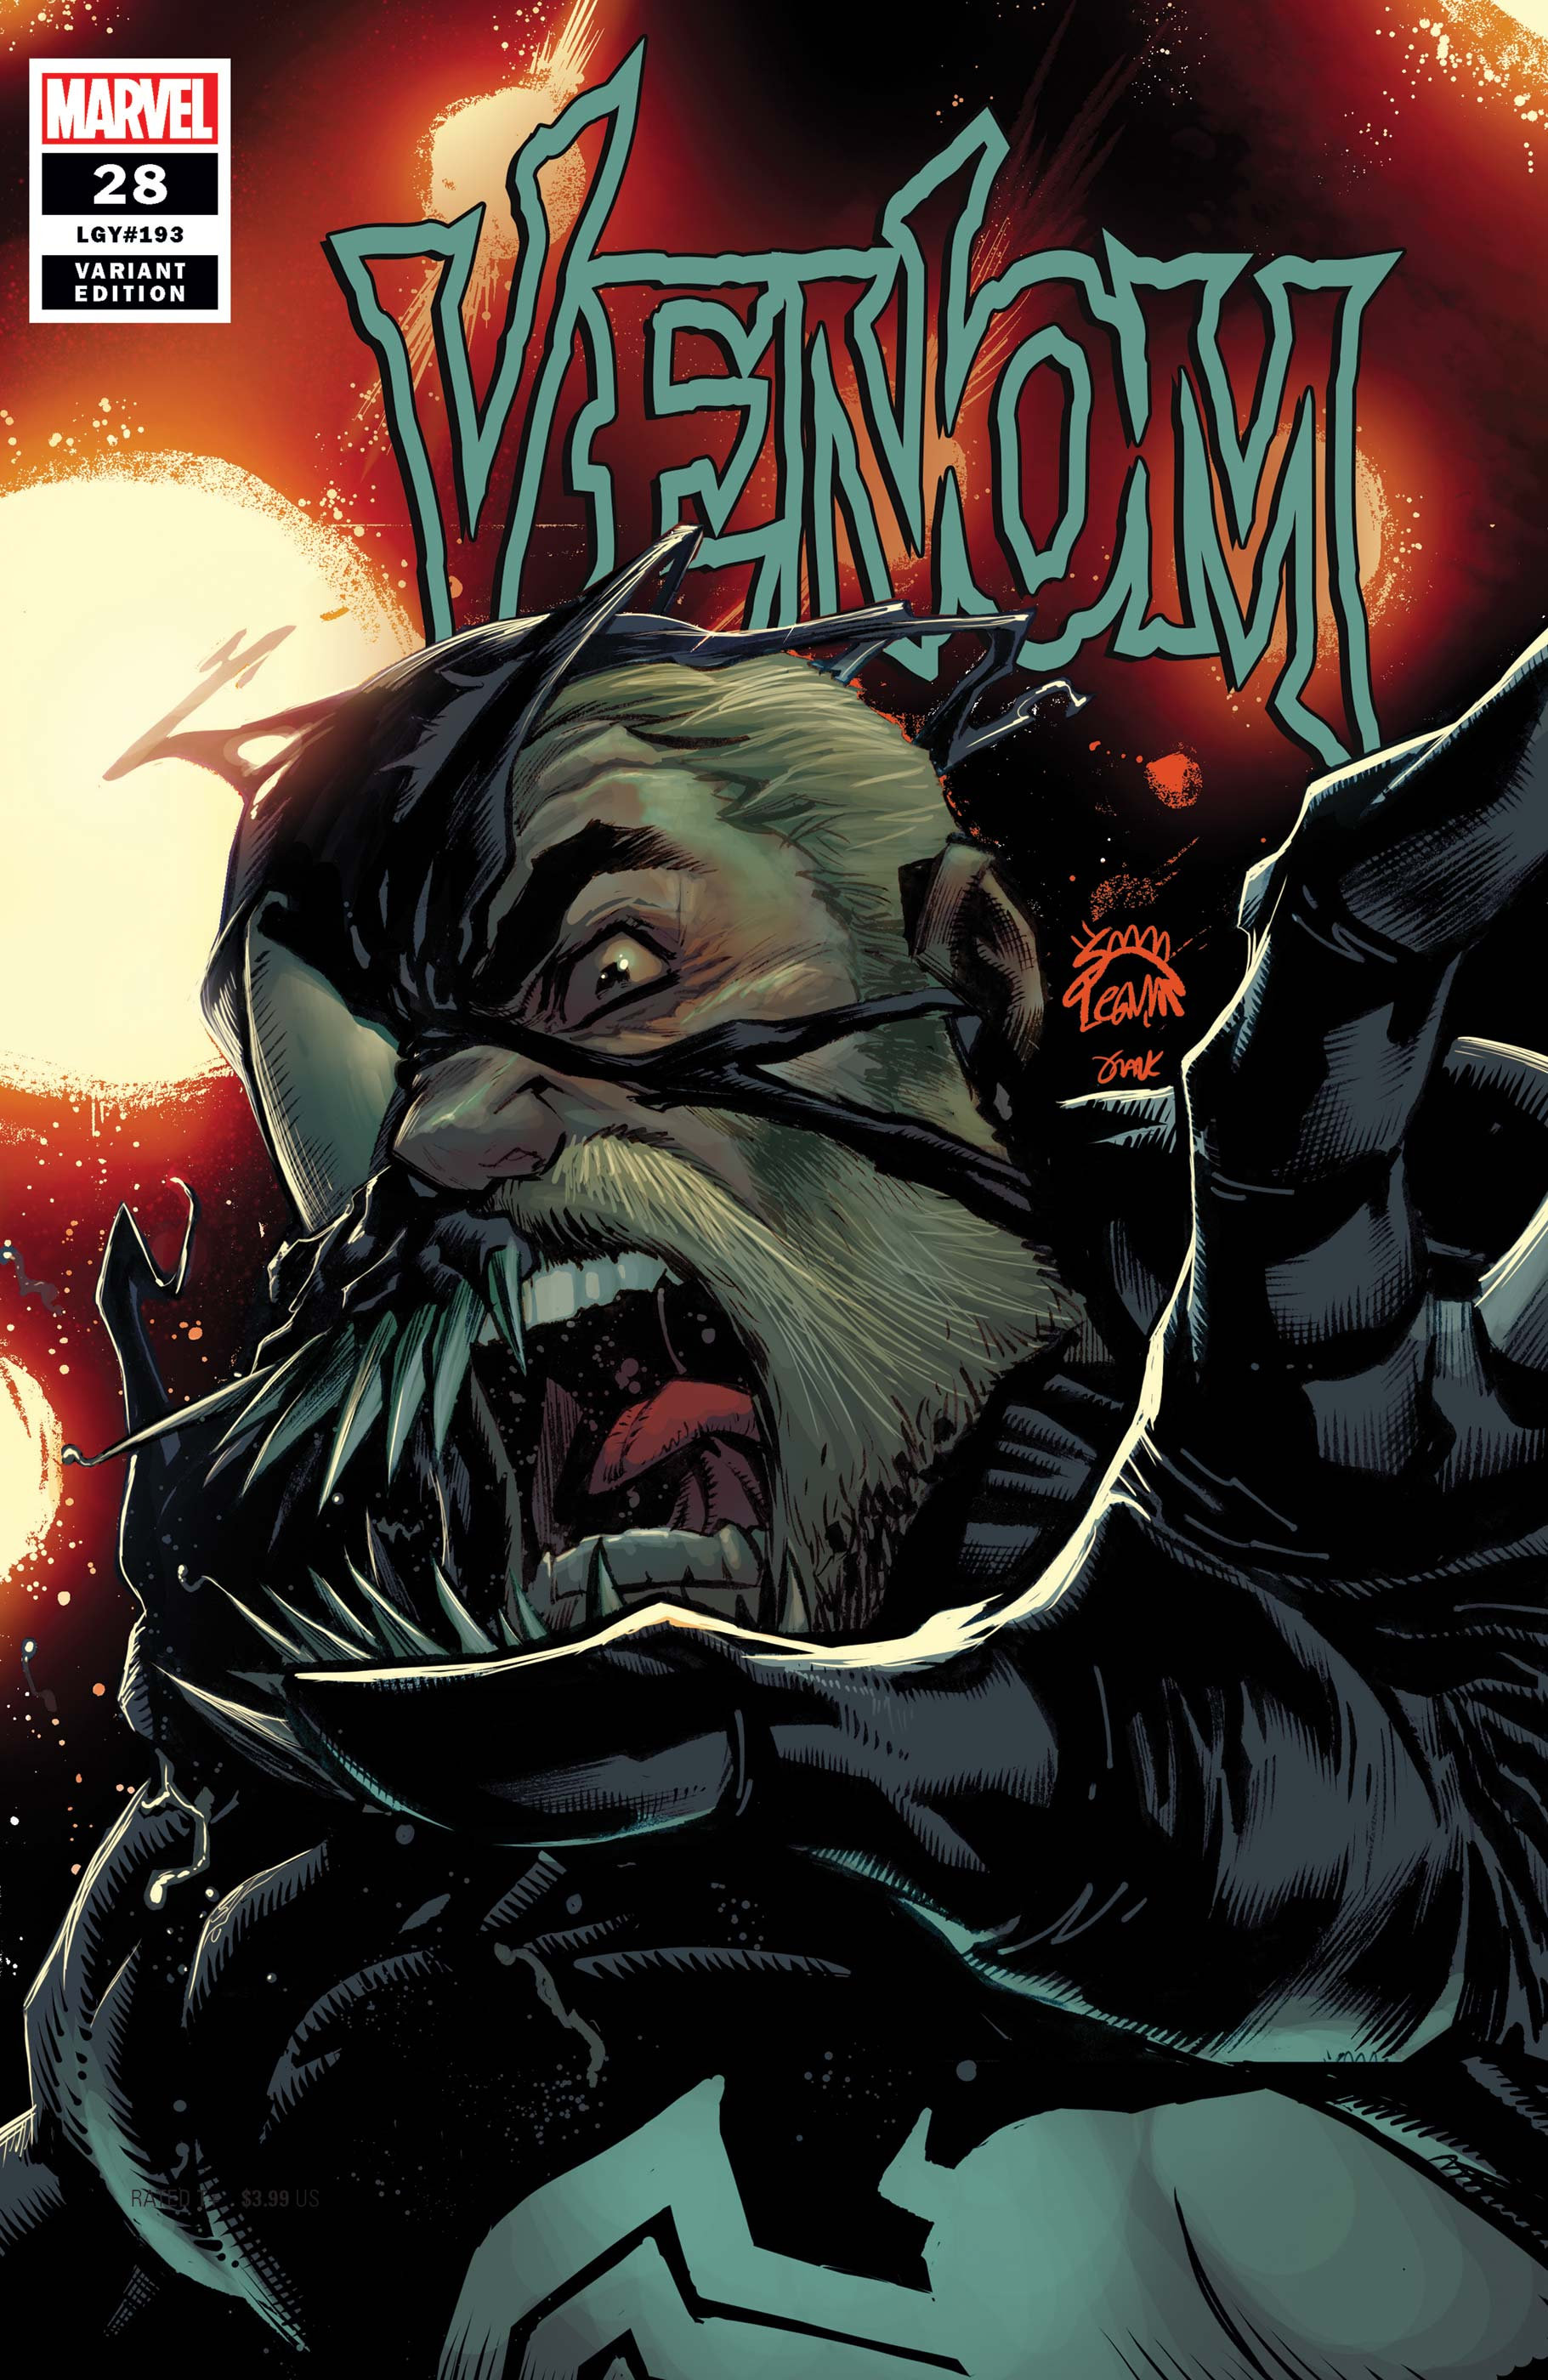 Venom (2018) #28 (Variant)